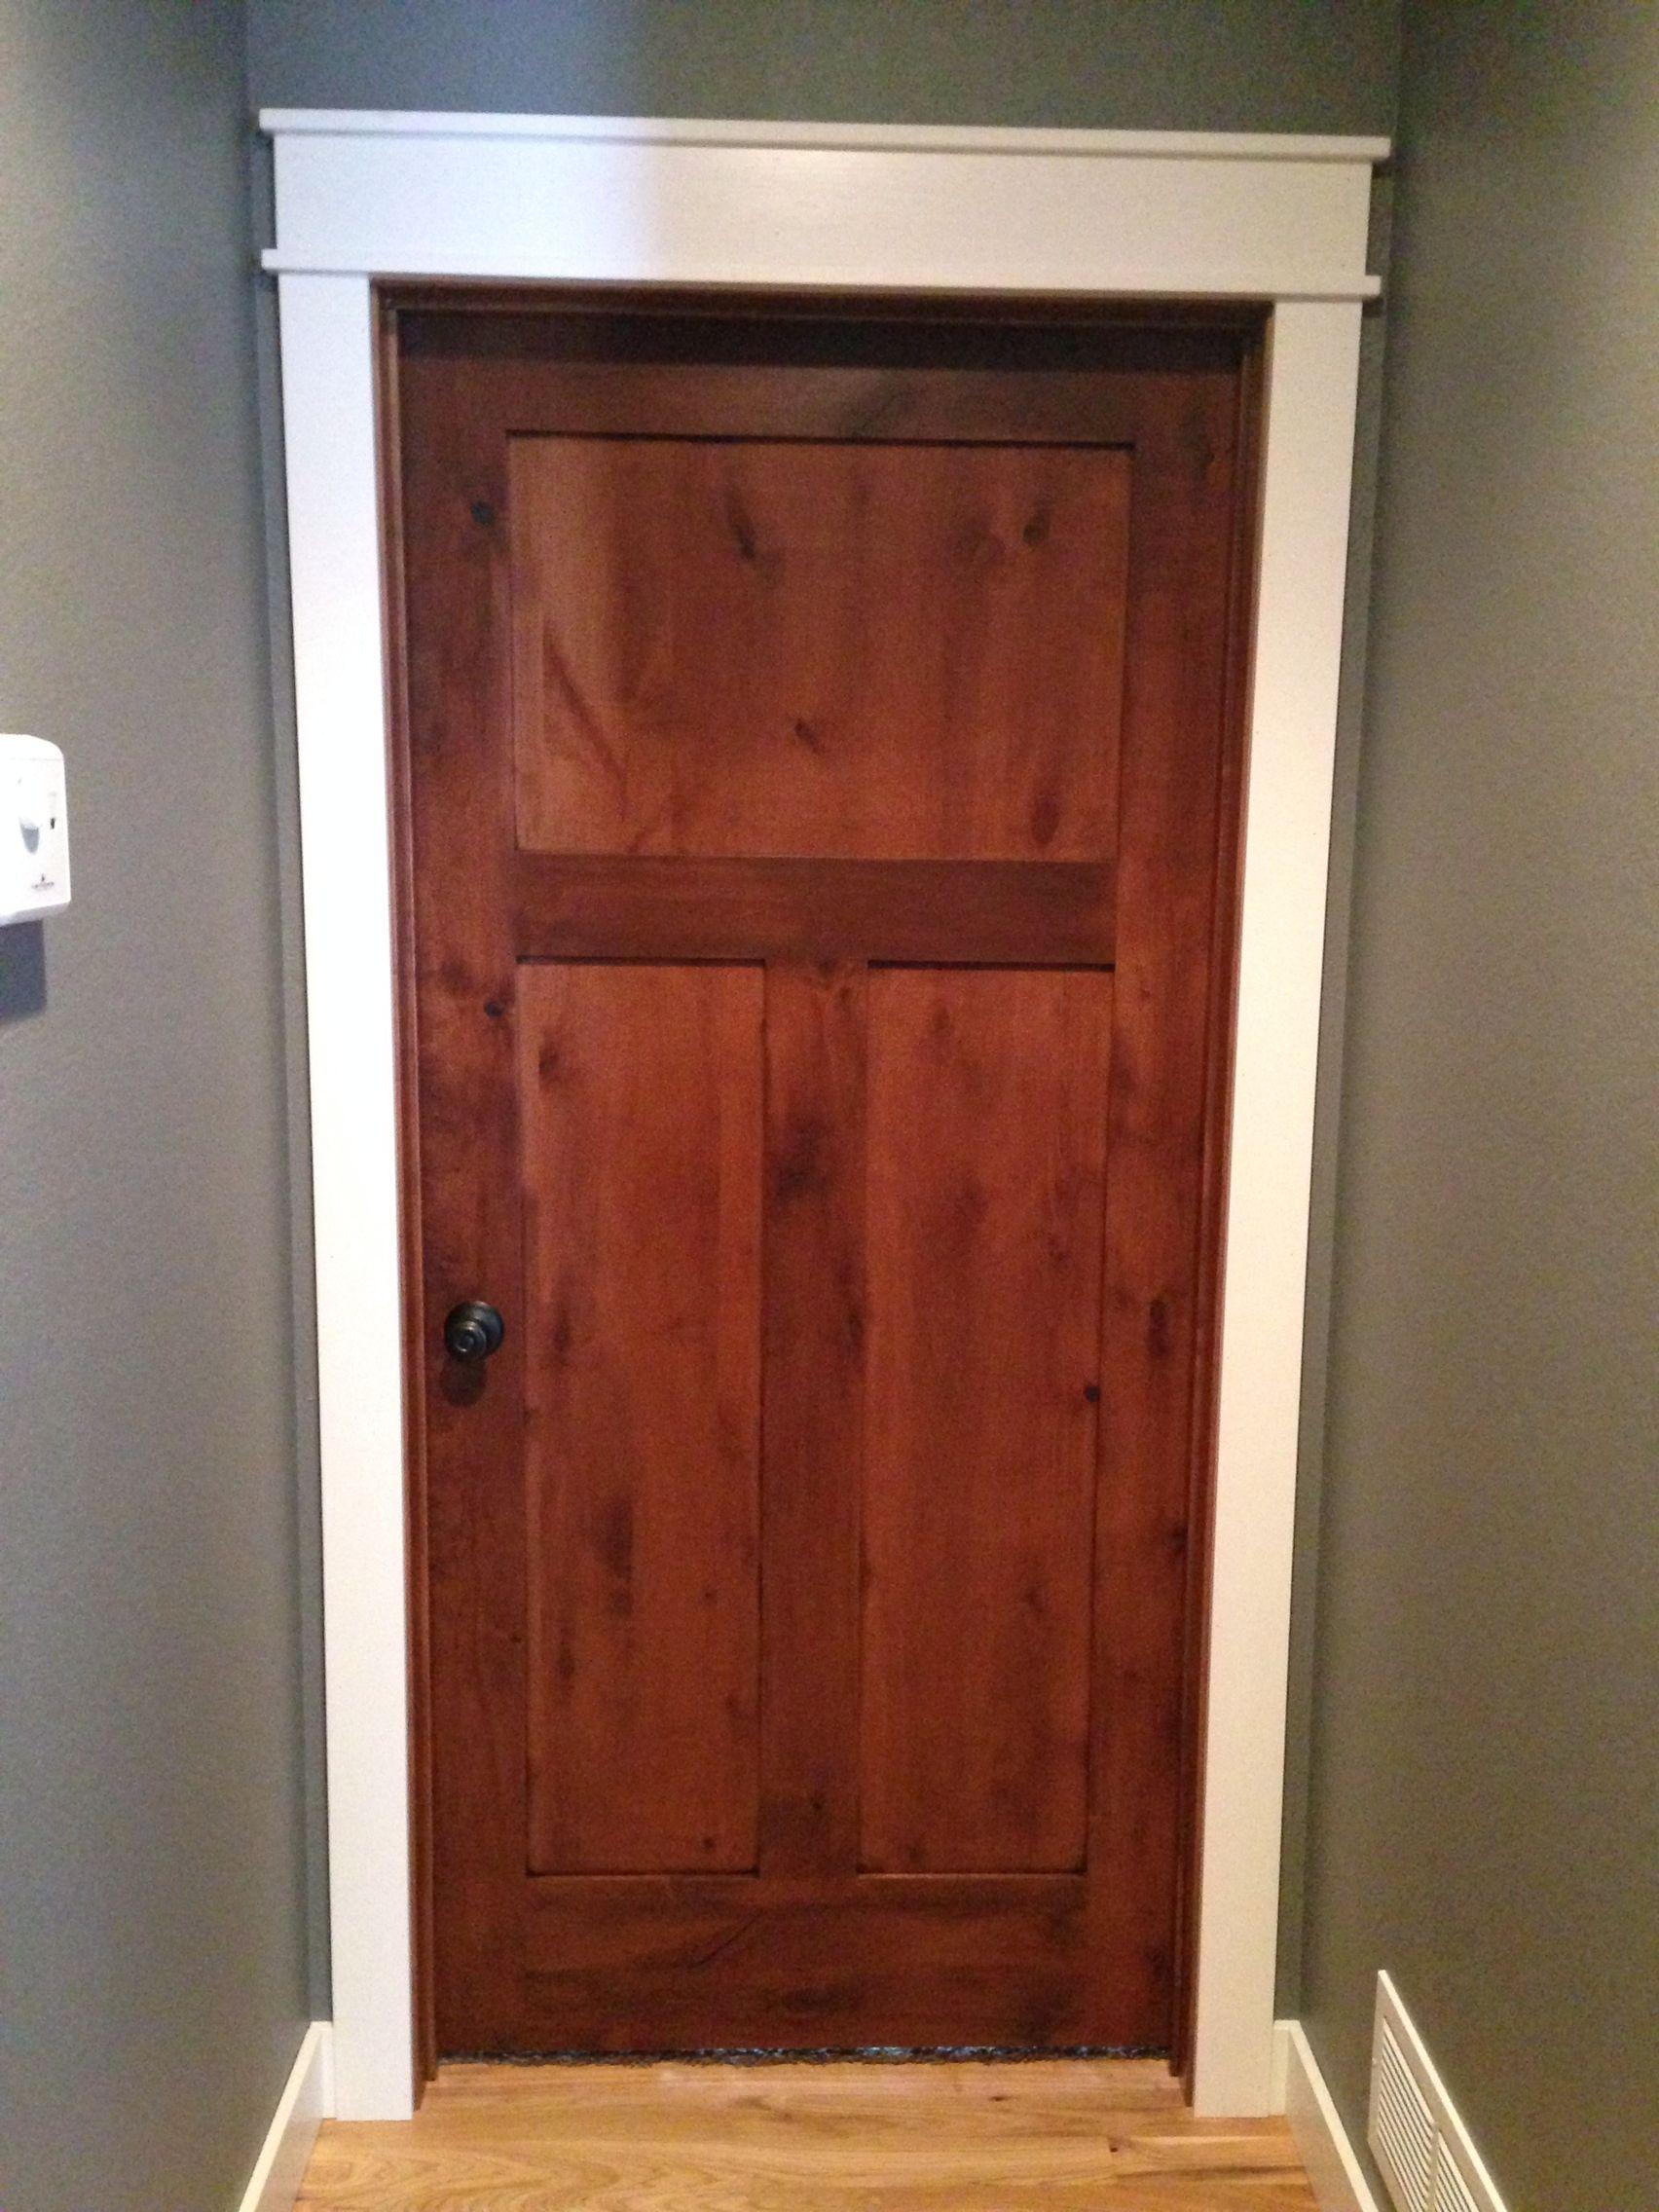 Rustic alder doors with white casings and trim Rustic